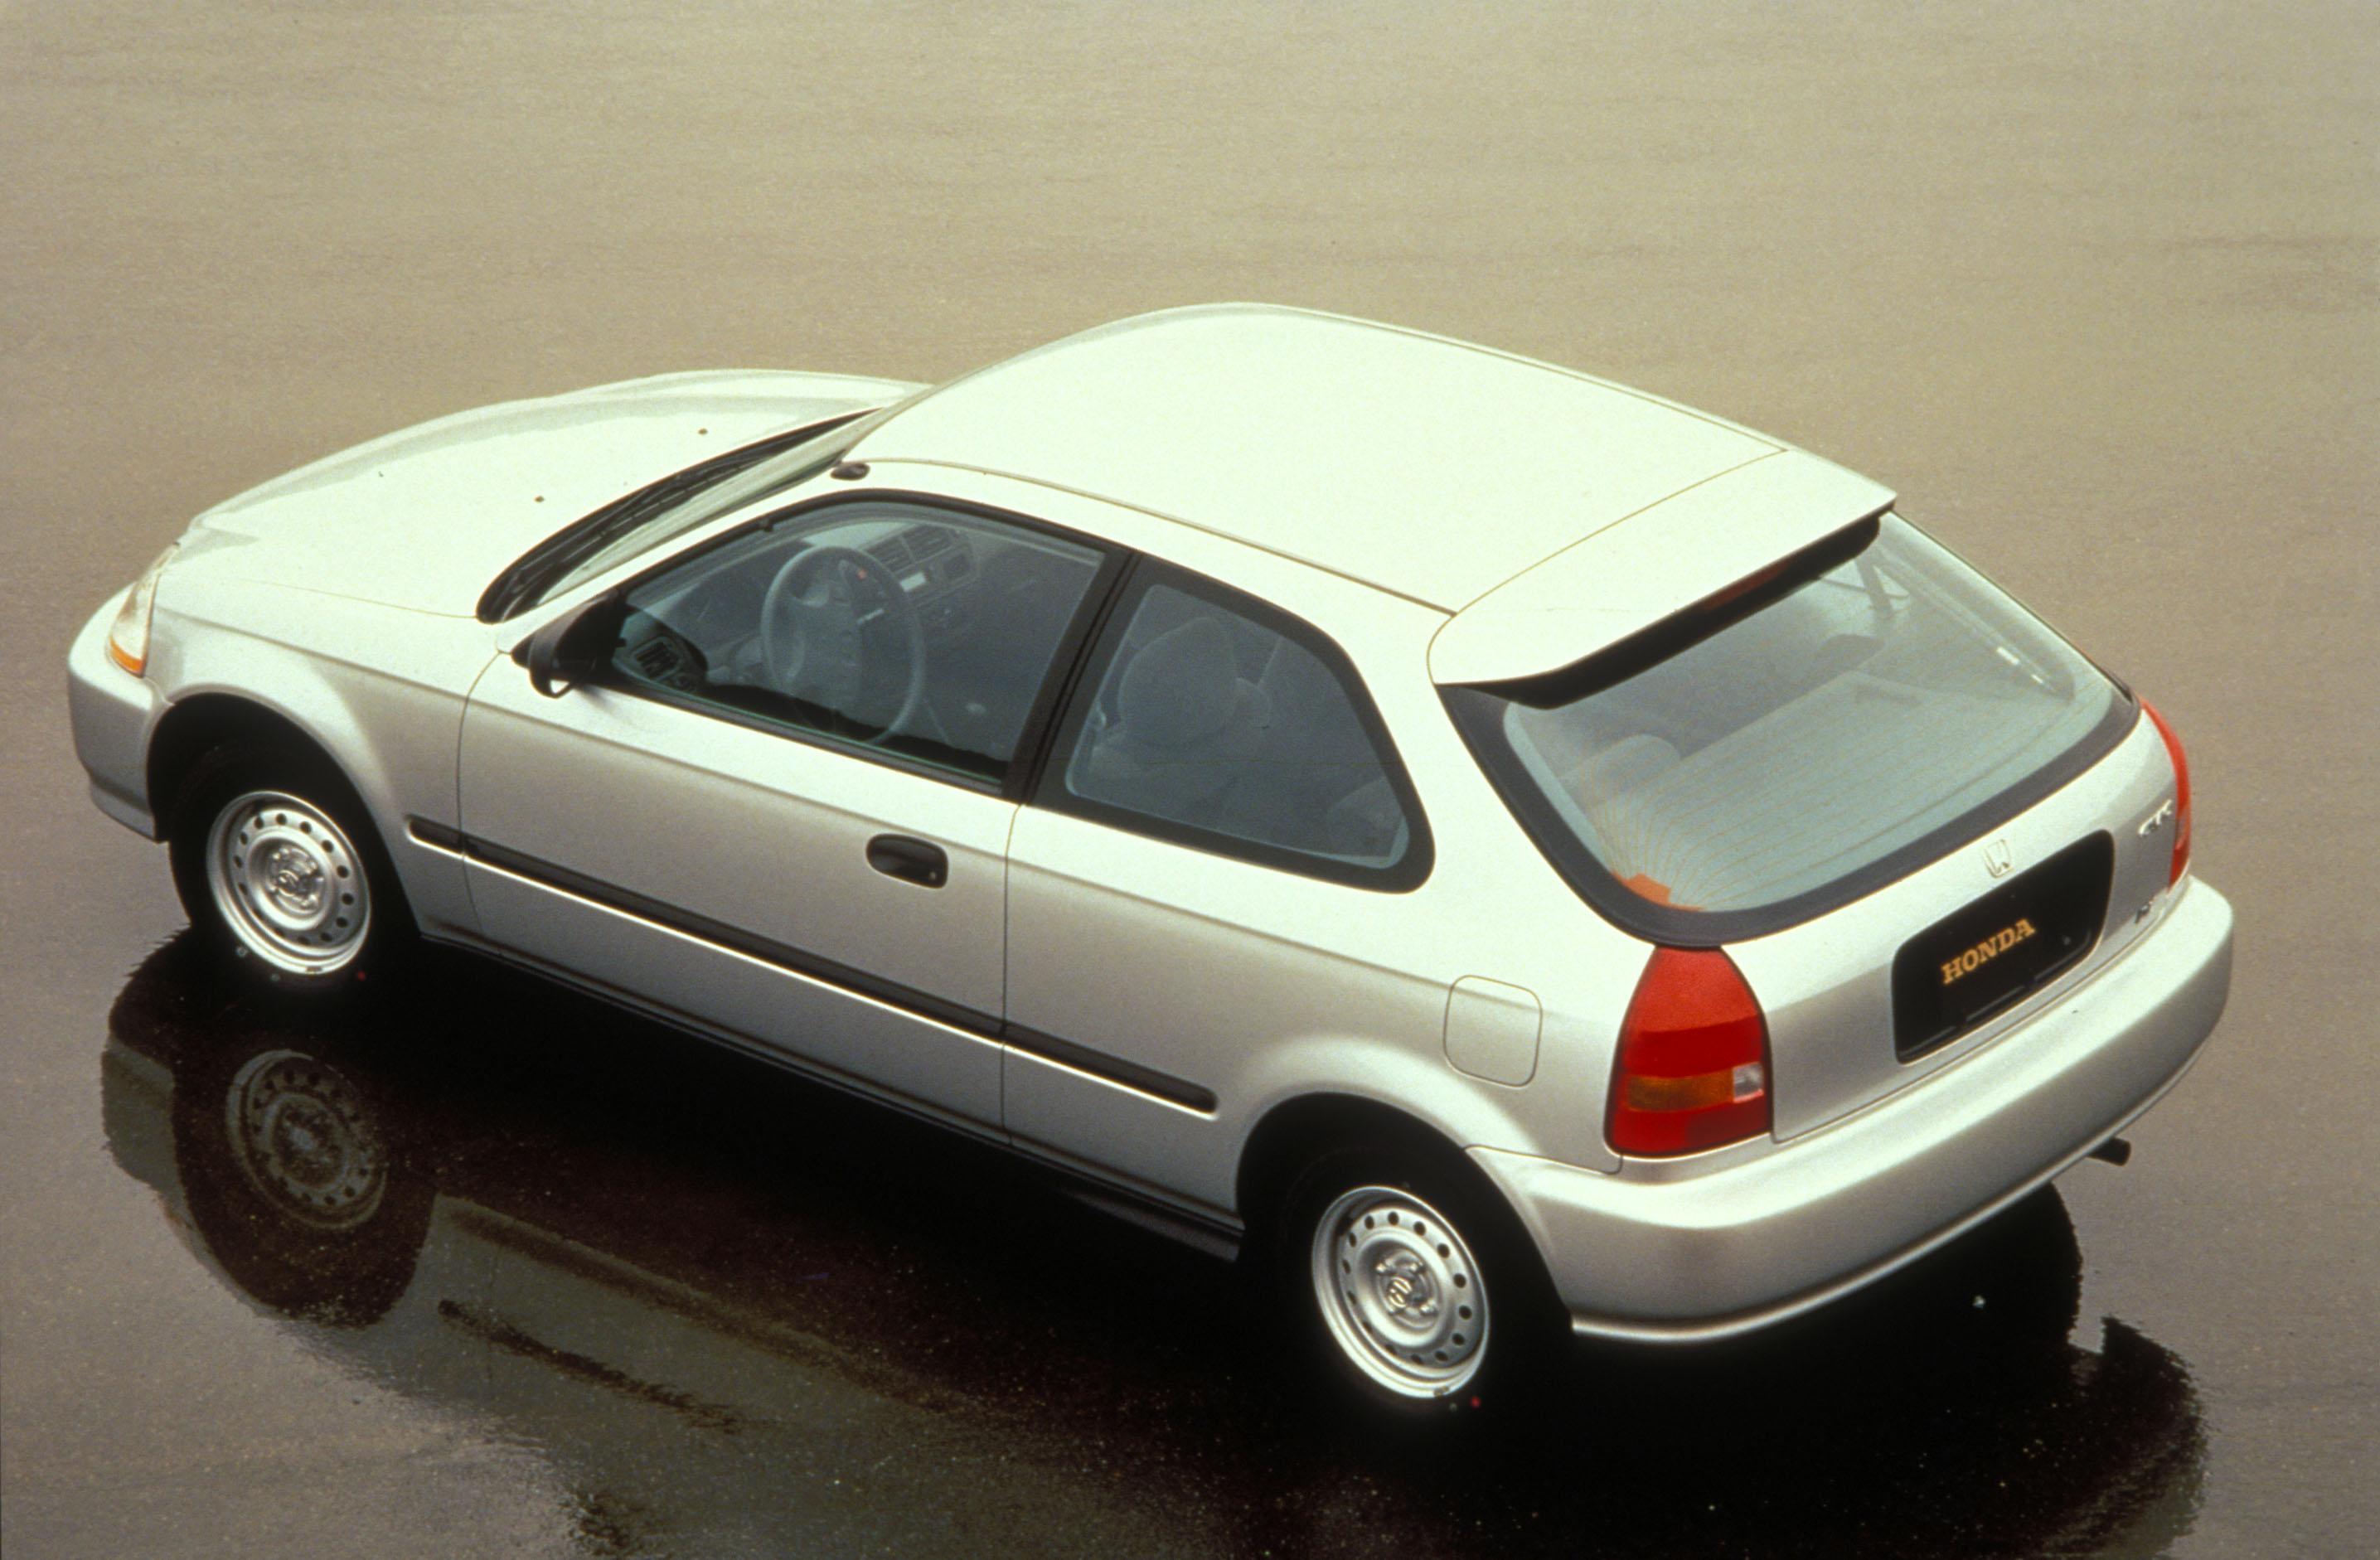 1996 Honda Civic HX Hatchback